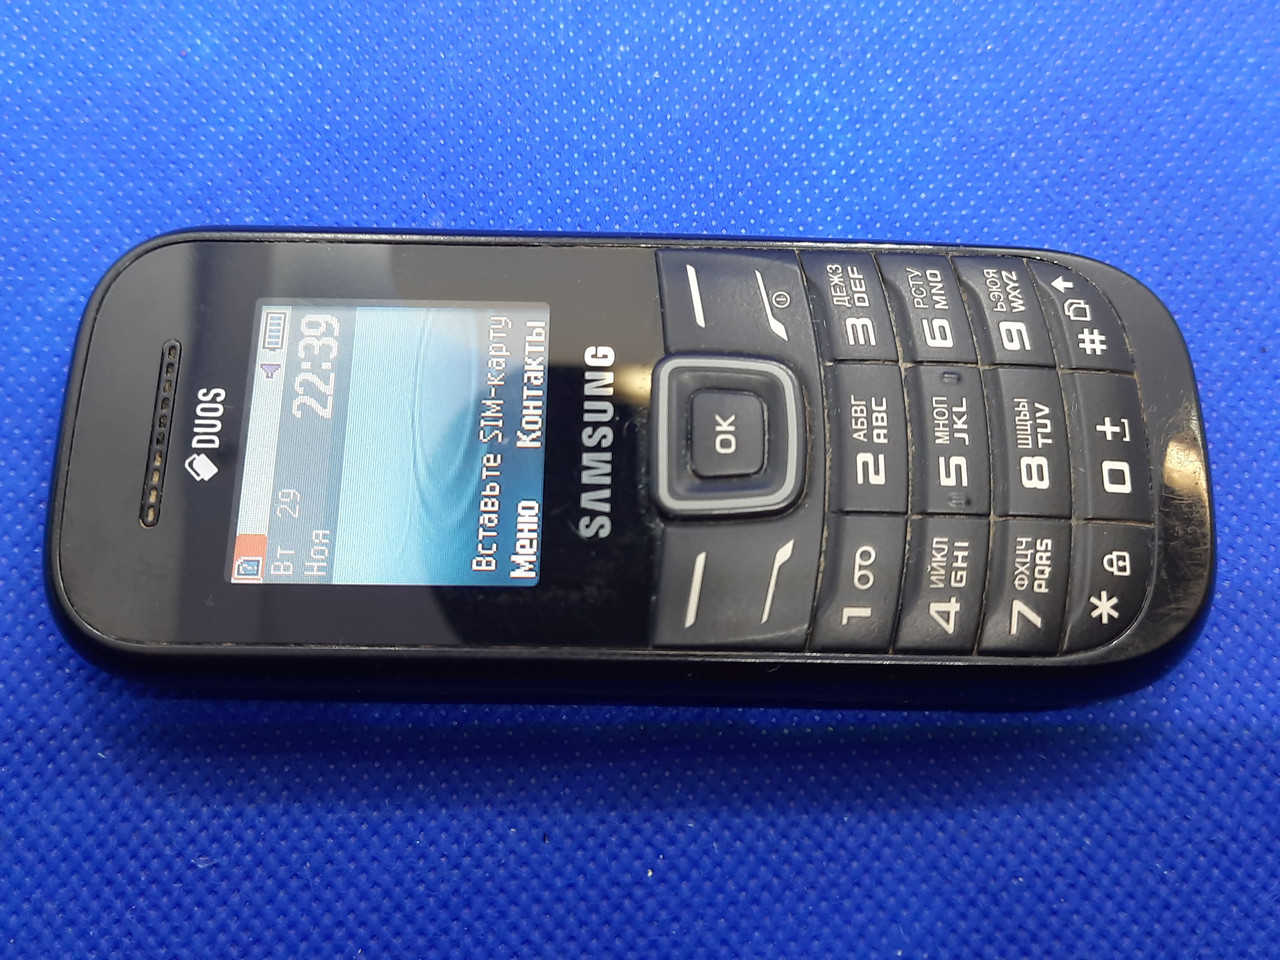 Samsung e1202i duos #7942 на запчастини